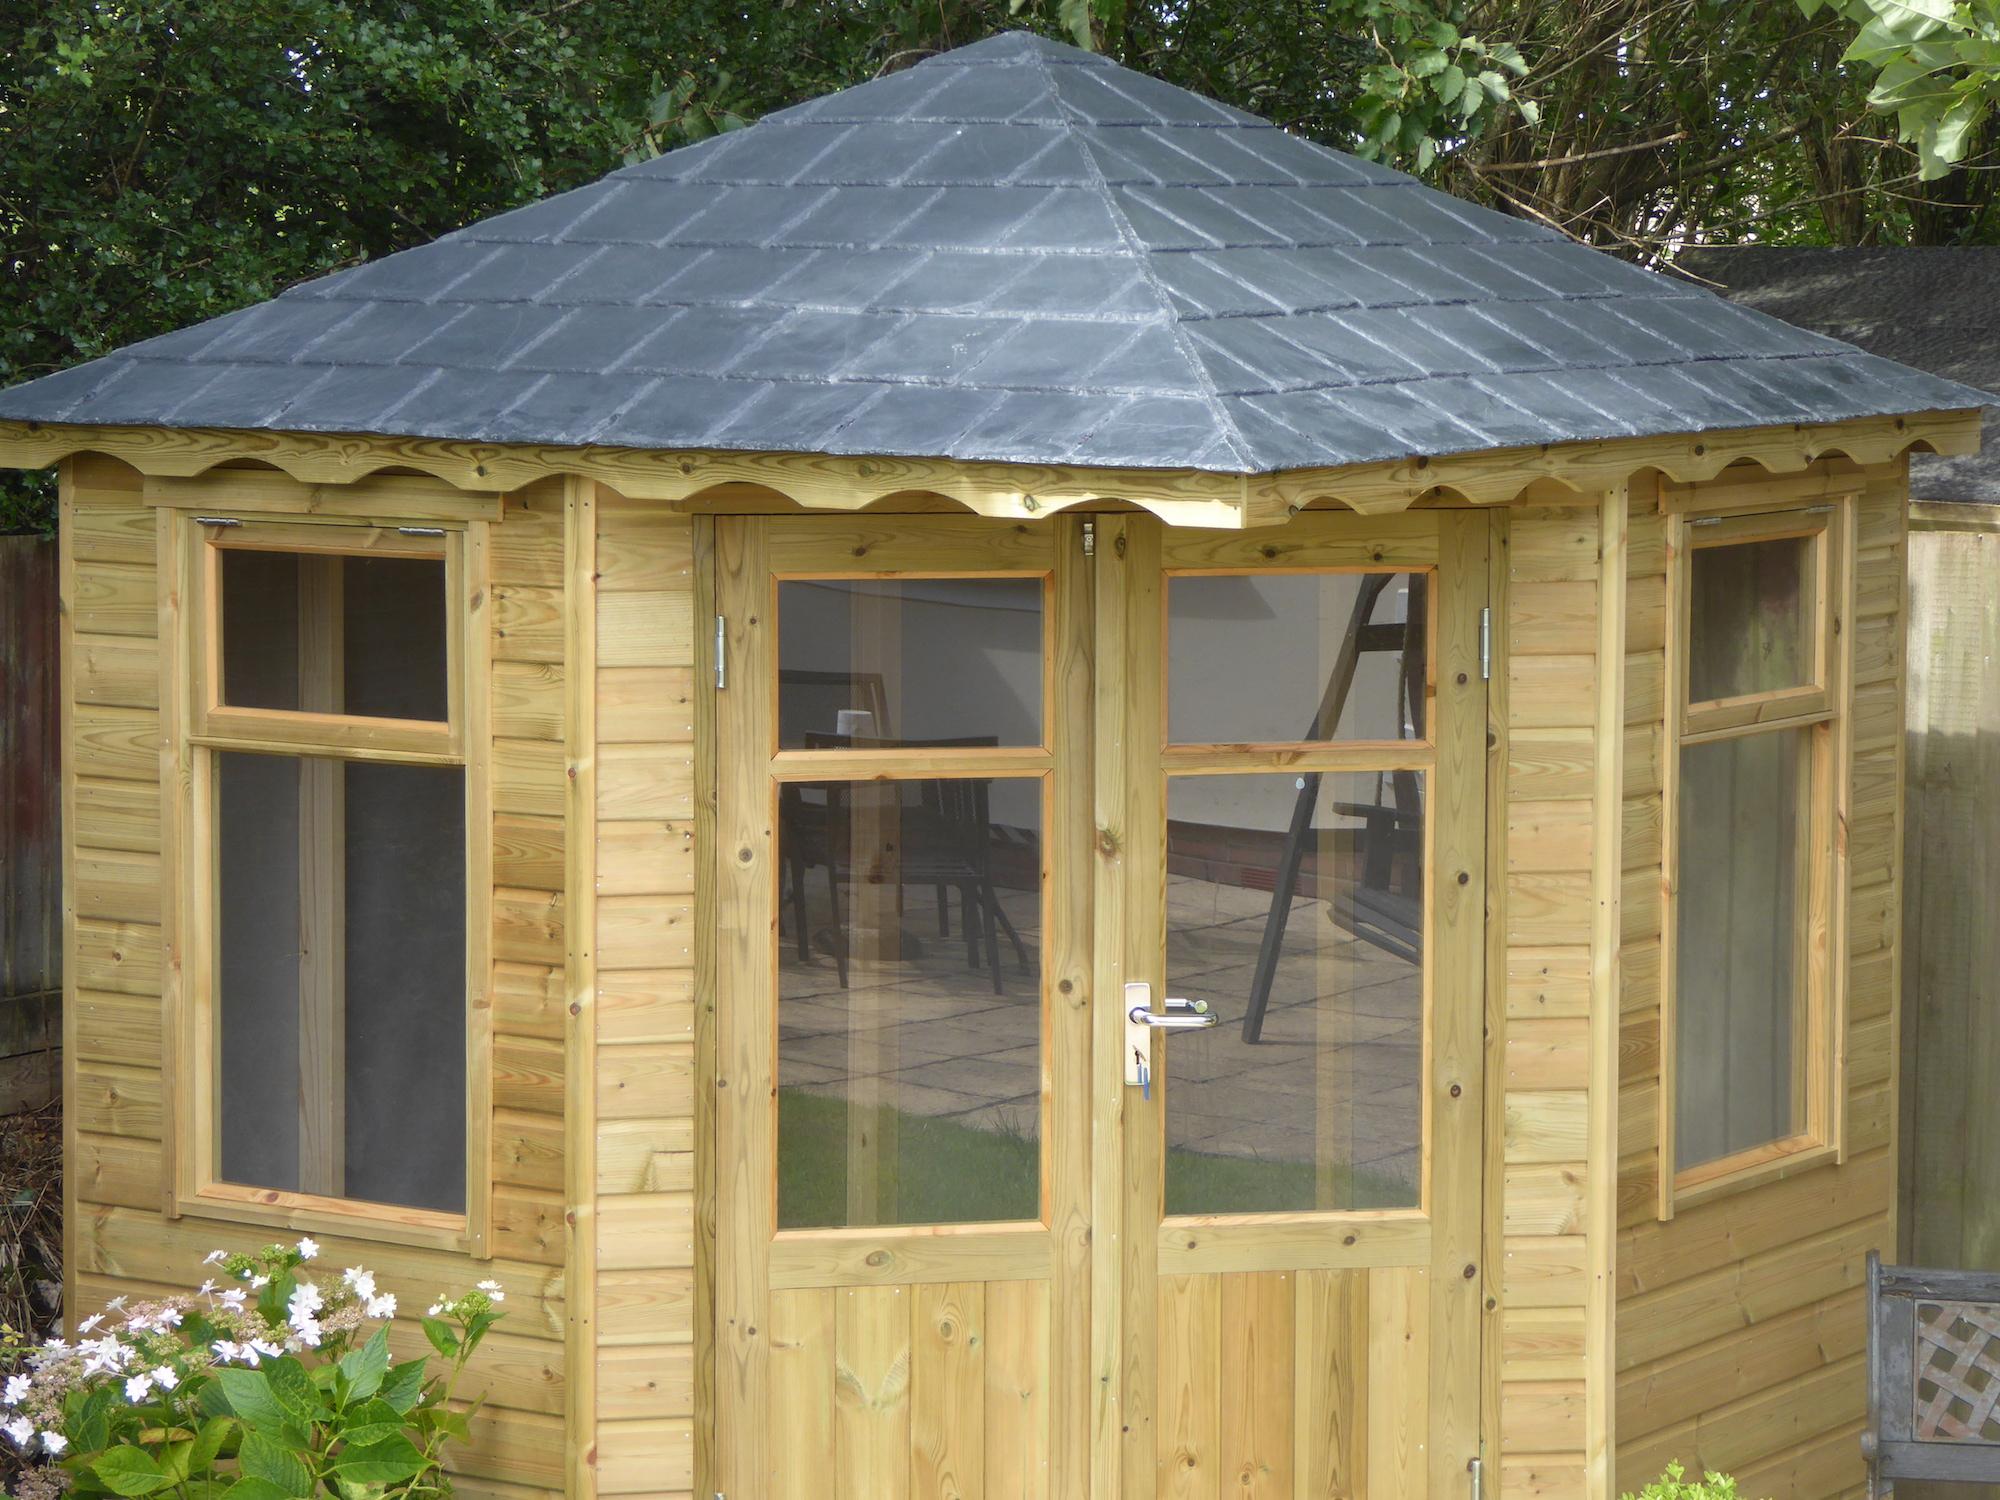 Fibreglass Slate Tile Roof On A Garden Building Shapes Grp